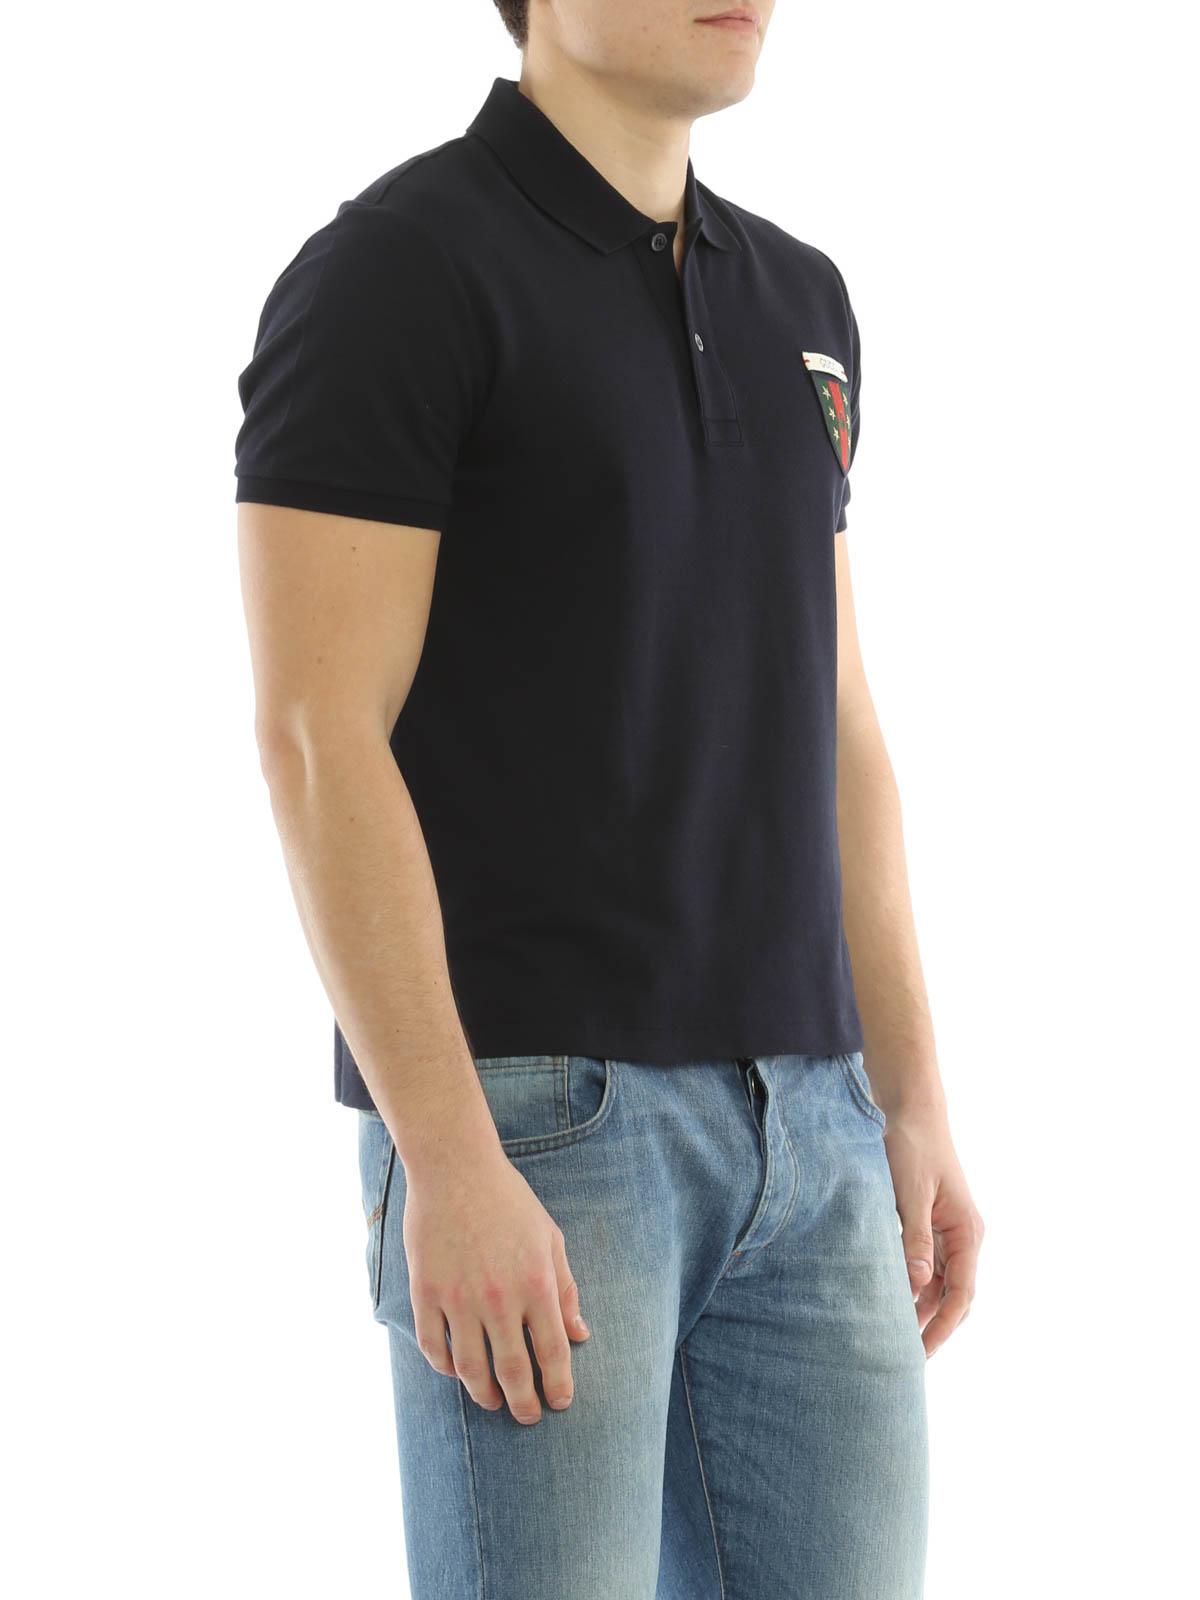 530d7cf6ce0e Gucci - Logo patch polo shirt - polo shirts - 408322 X7333 4440